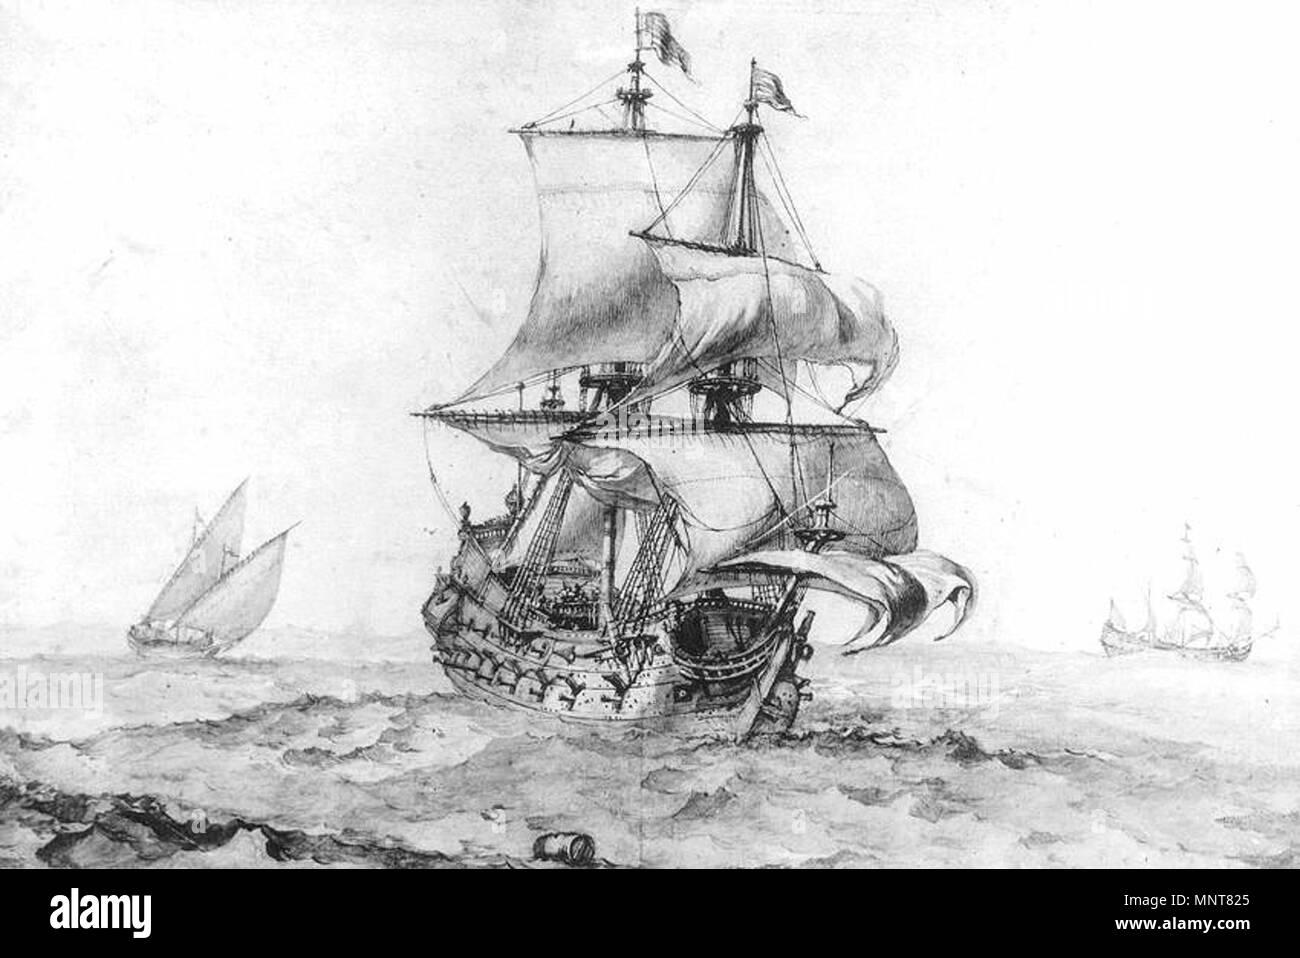 Great Vessel of War   1670s.   988 Pierre Puget - Great Vessel of War - WGA18476 - Stock Image